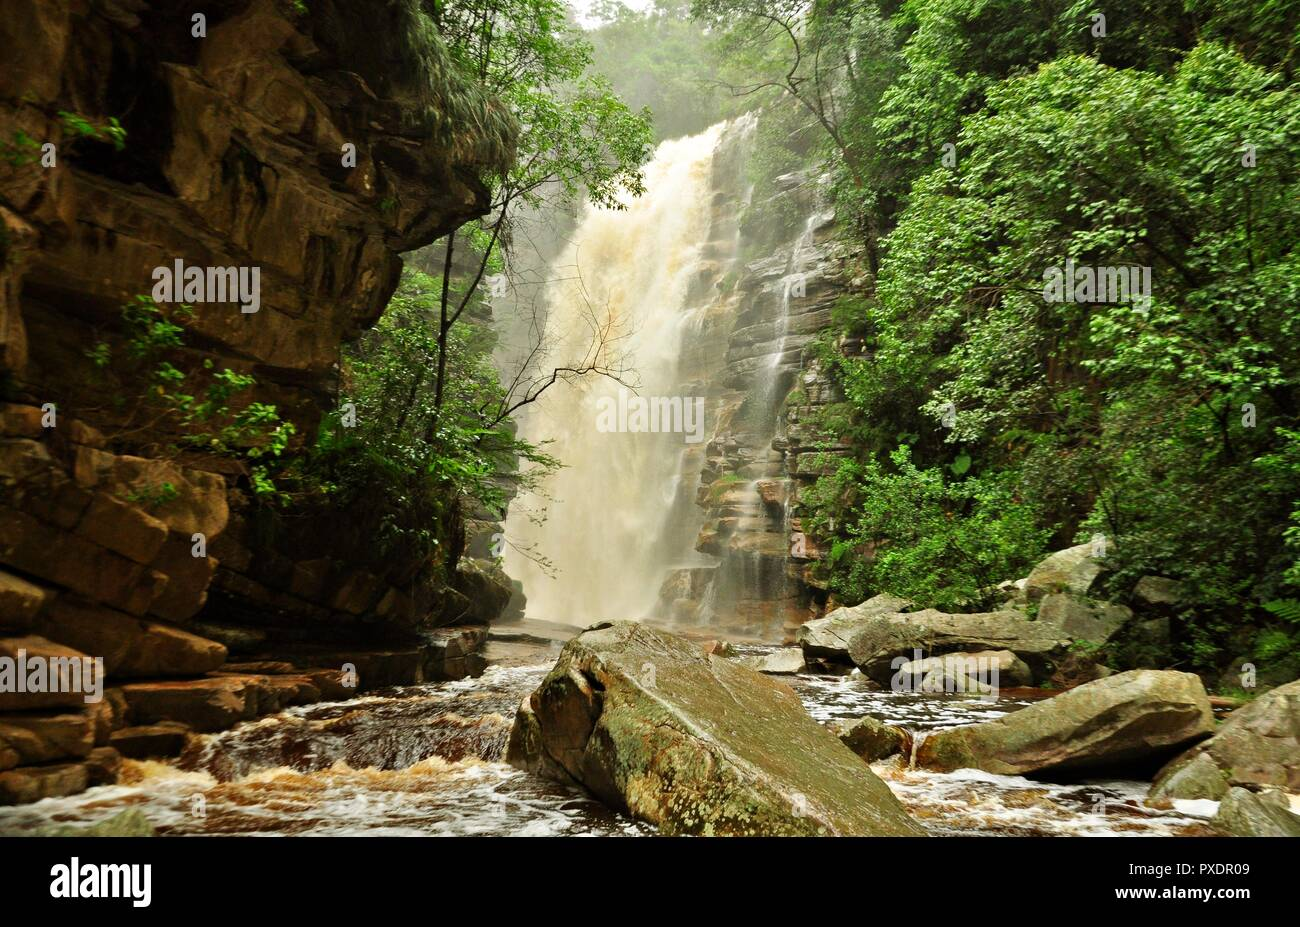 Cachoeira do Mosquito - Chapada Diamantina - Brasil - Stock Image